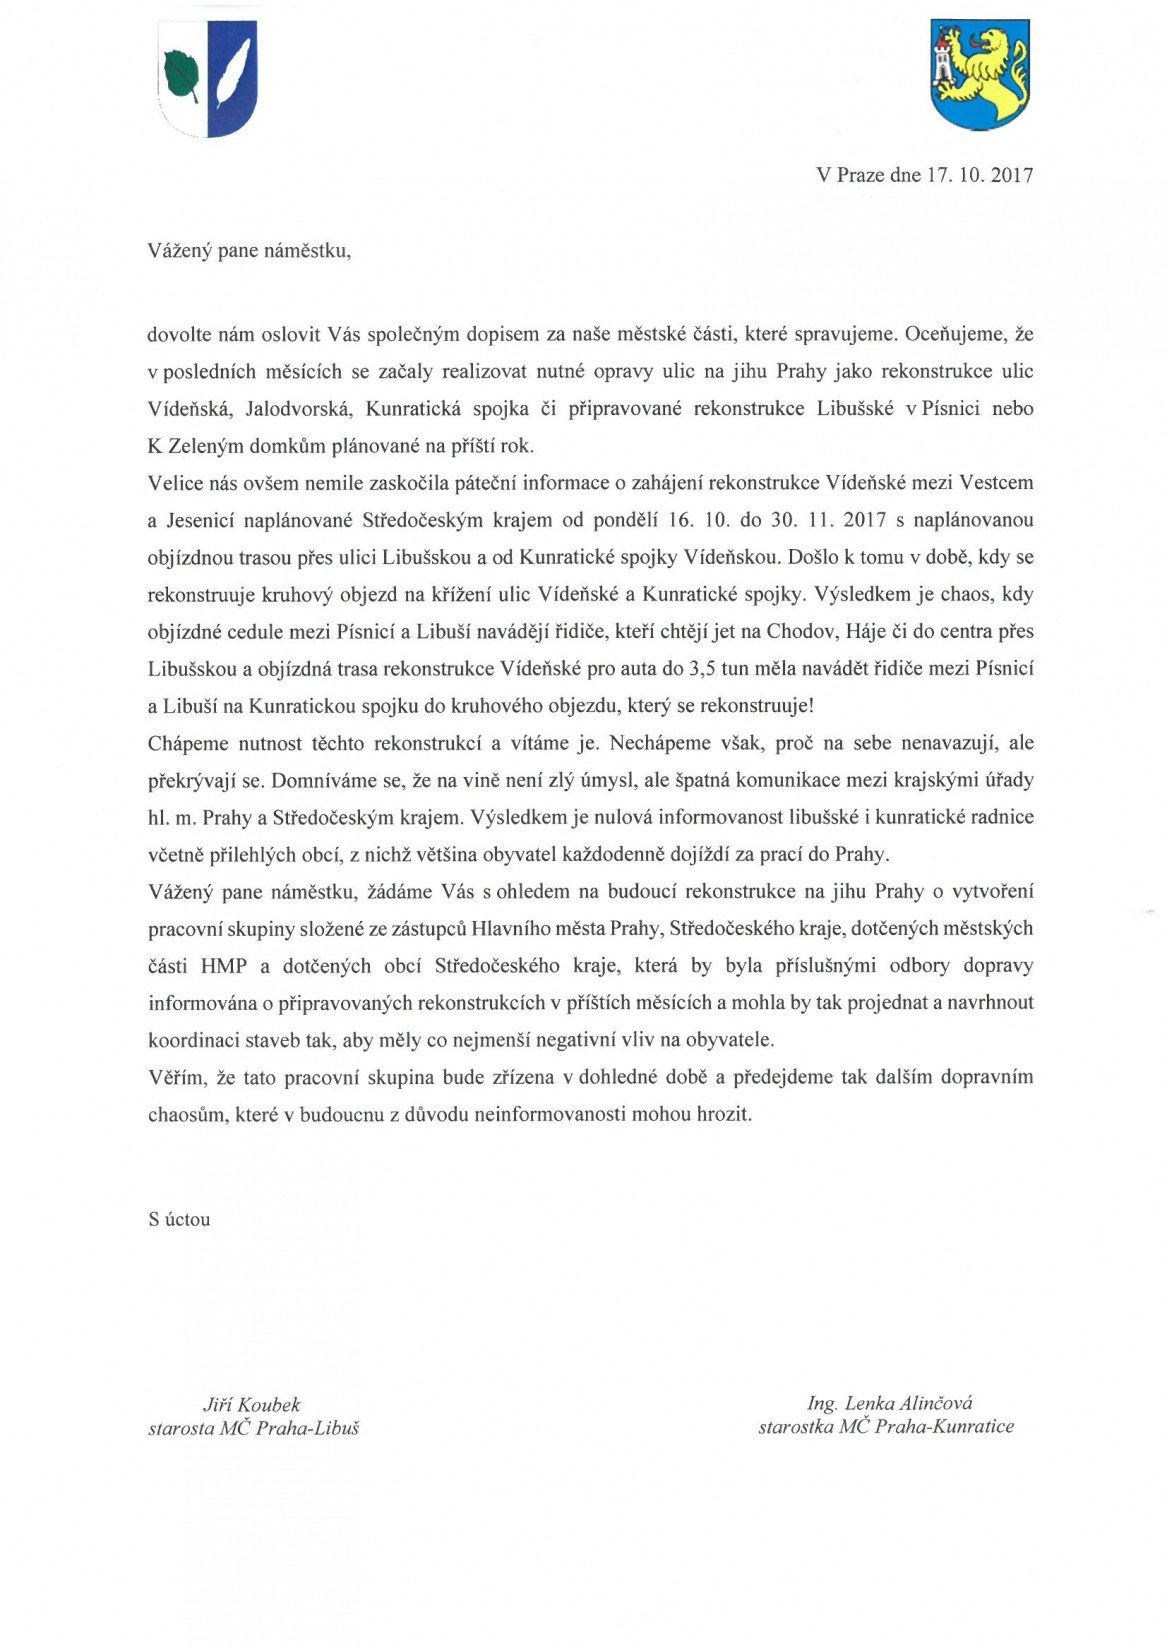 Dopis se žádostí o koordinaci staveb silnic v k.ú. Kunratice